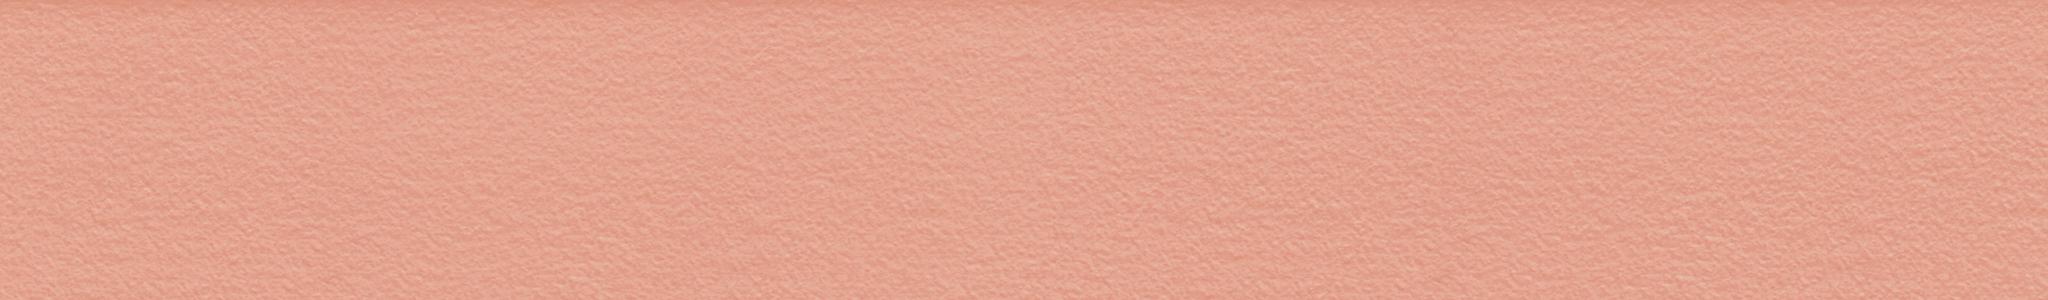 HU 139501 canto ABS rojo perla fino 107